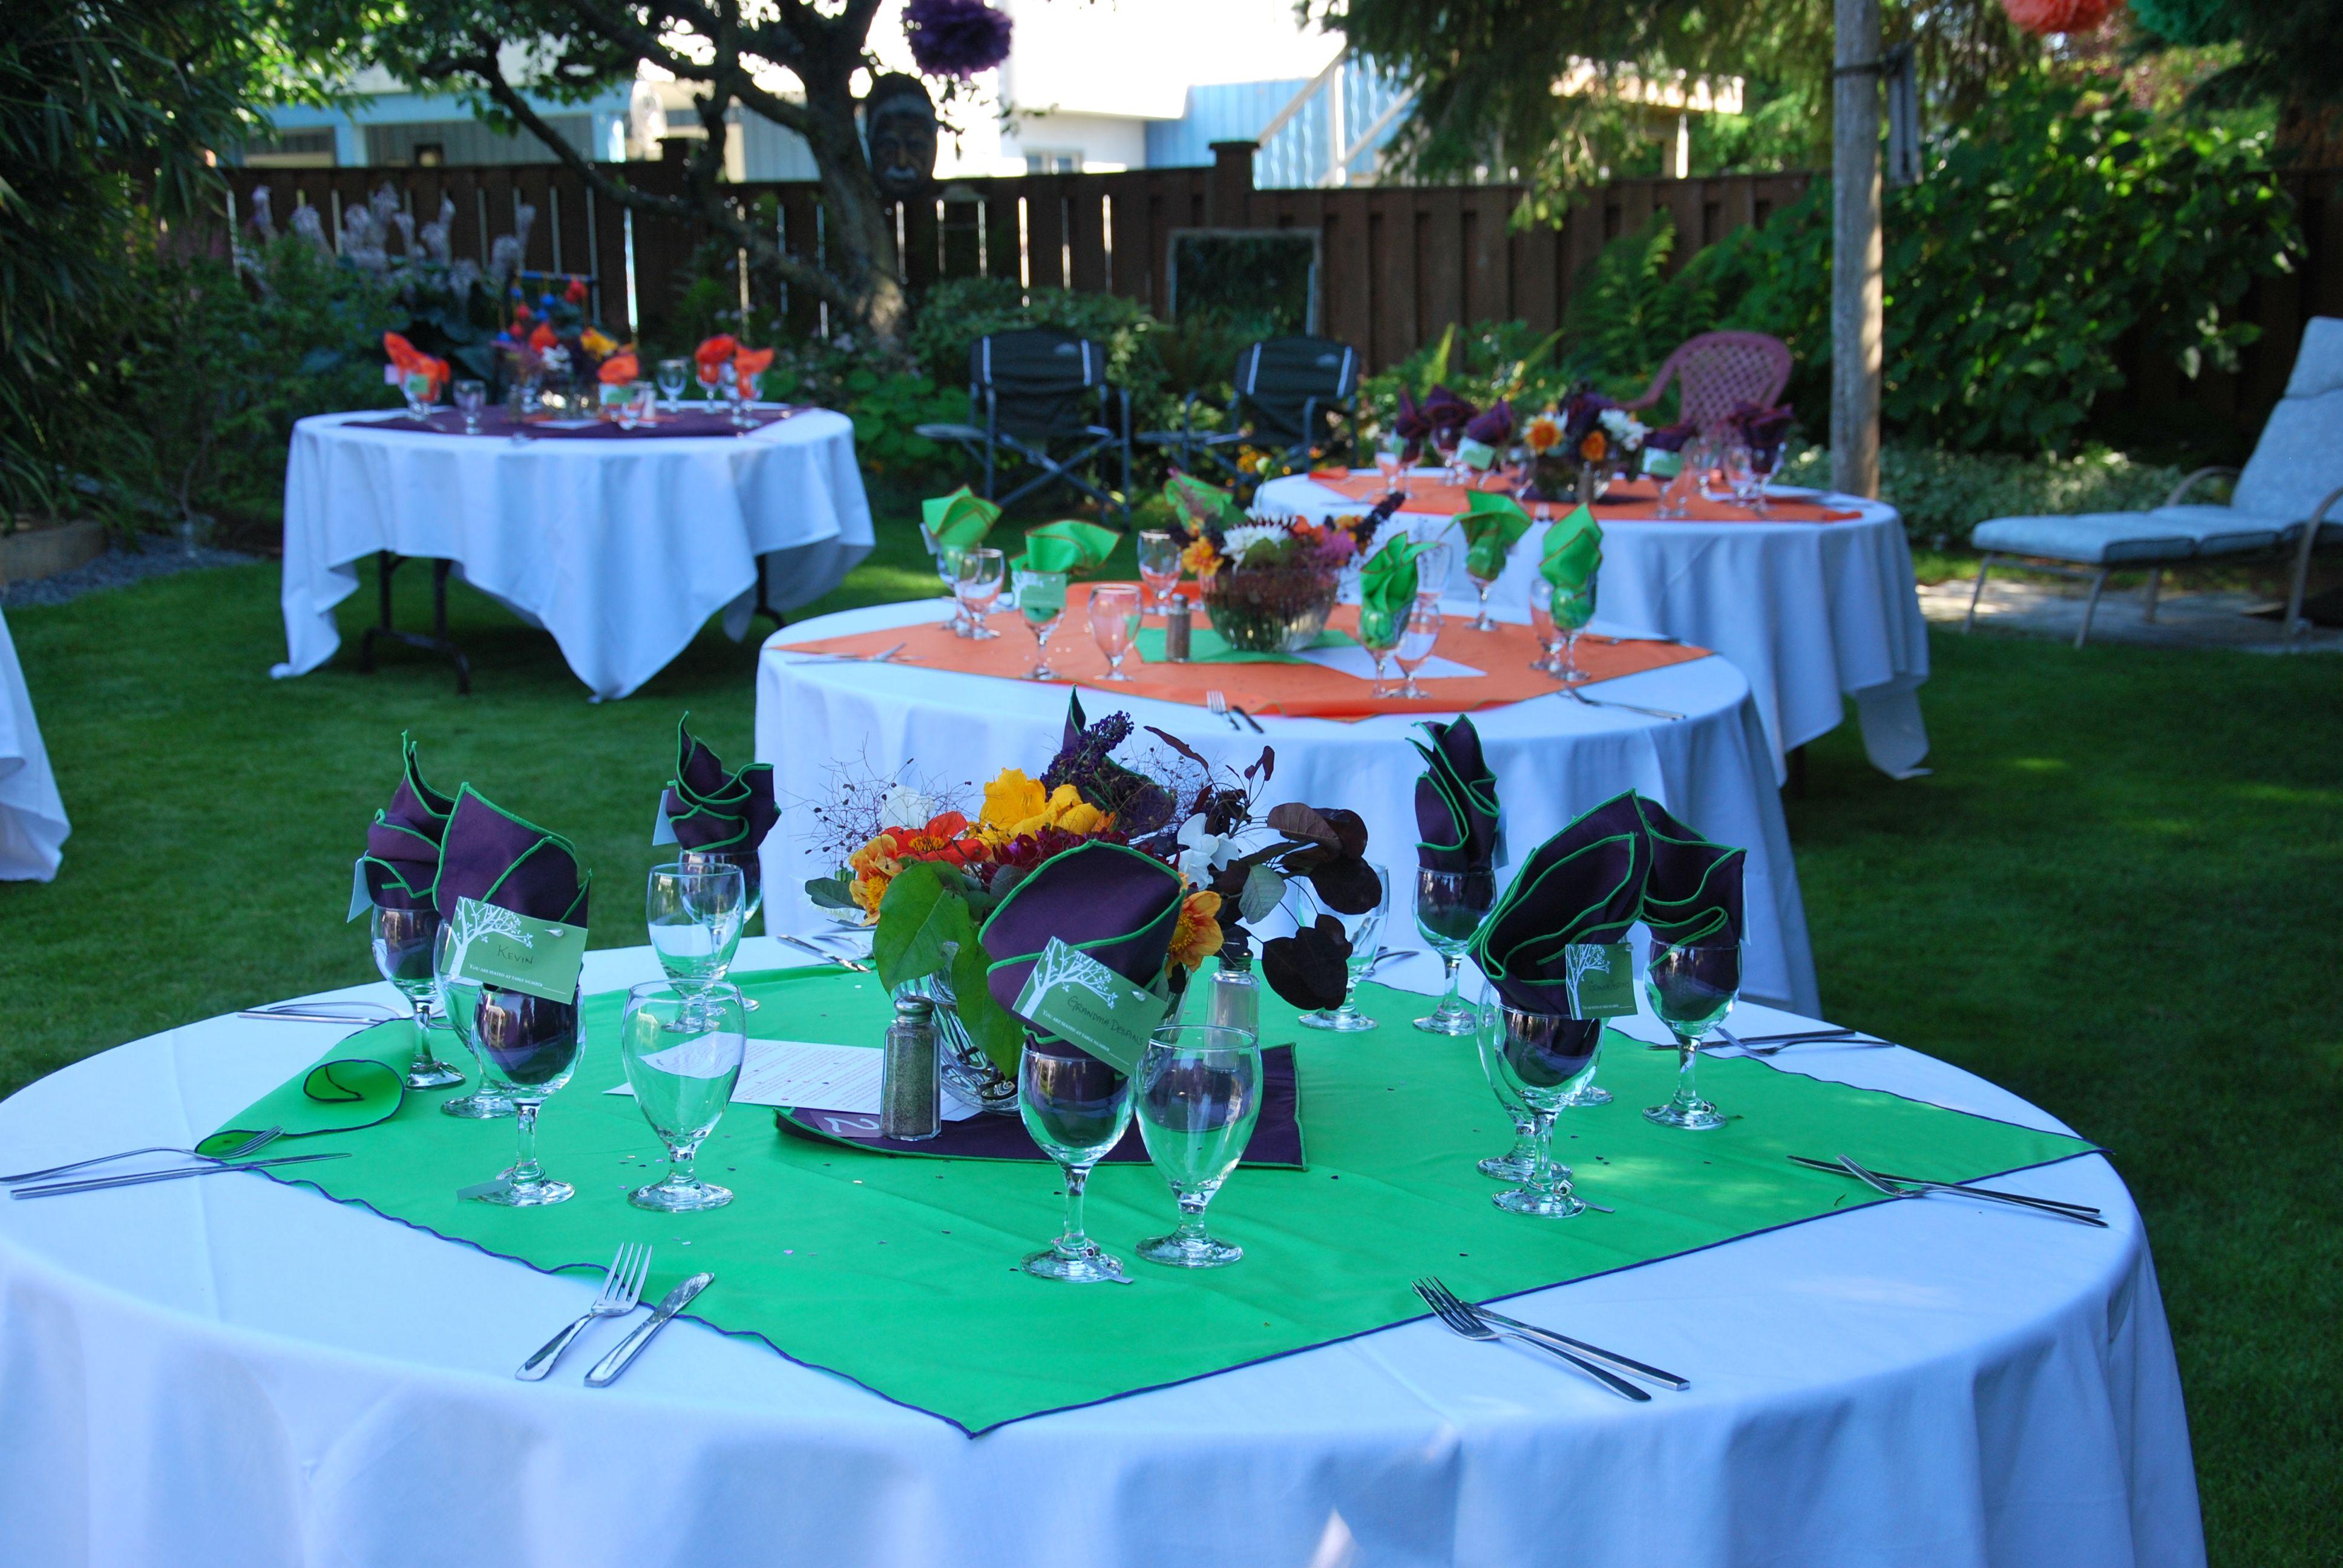 DIY backyard wedding reception with home-made table ...